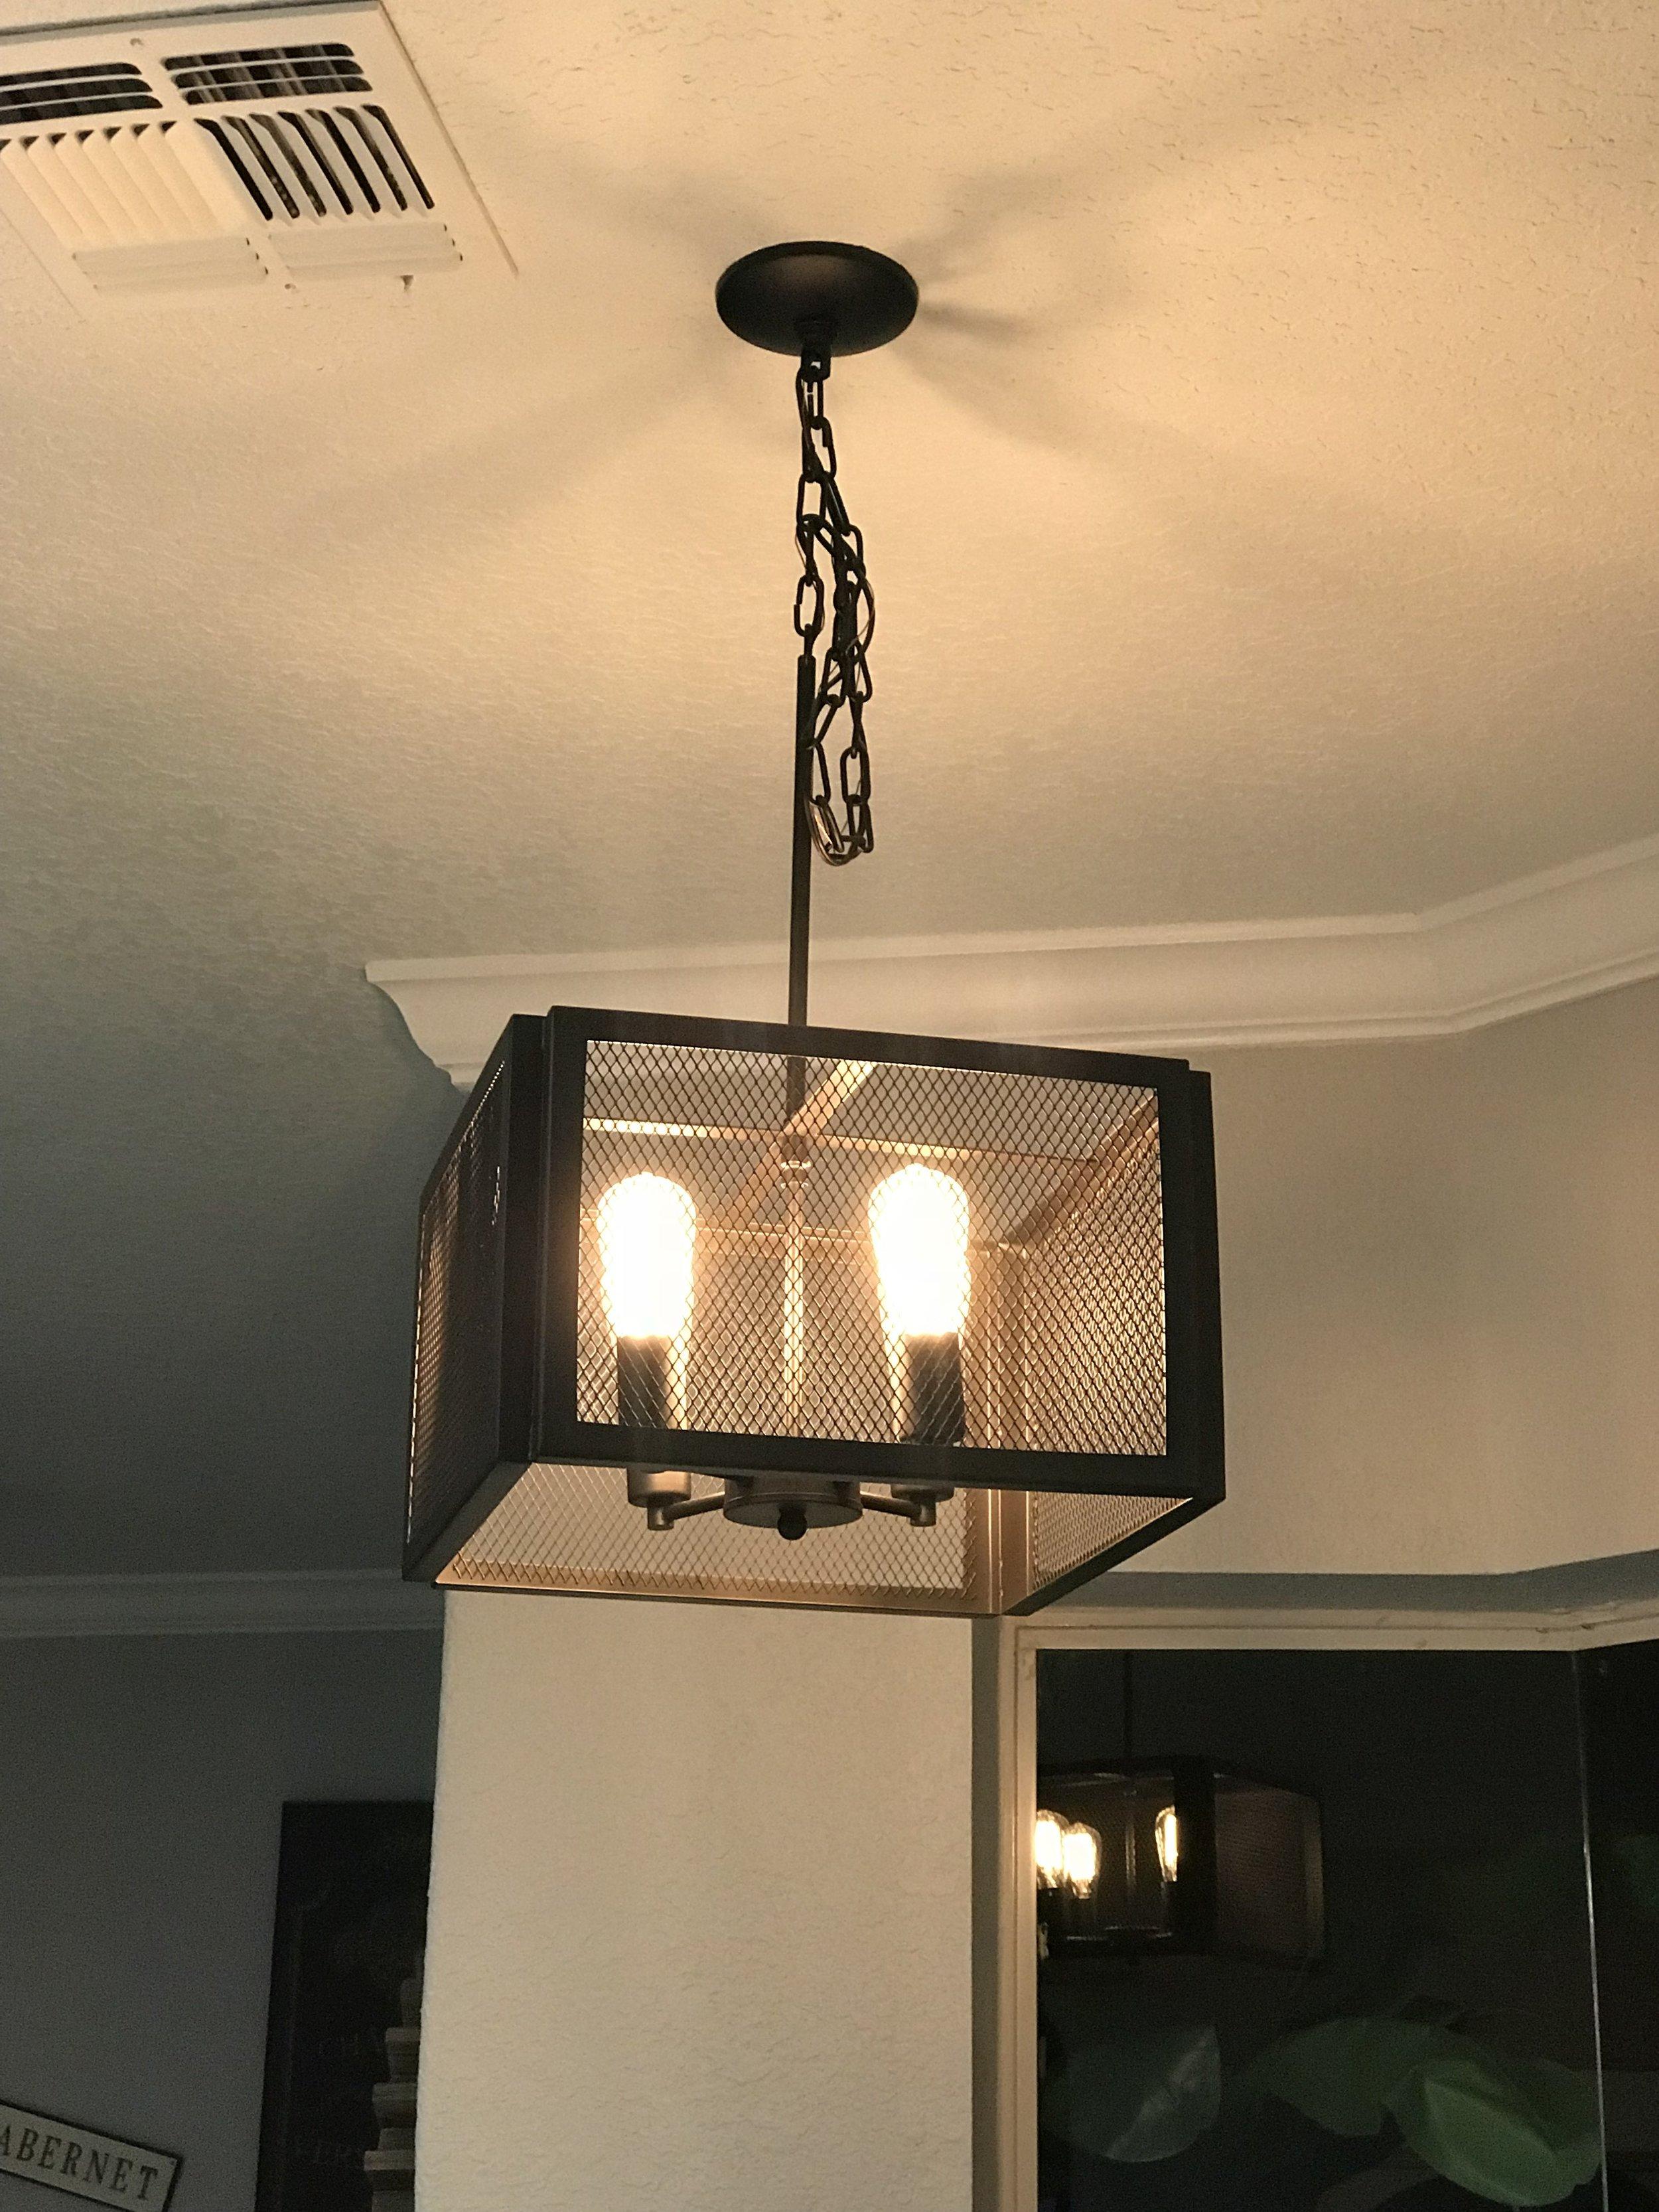 Dining Area Lighting Fixture